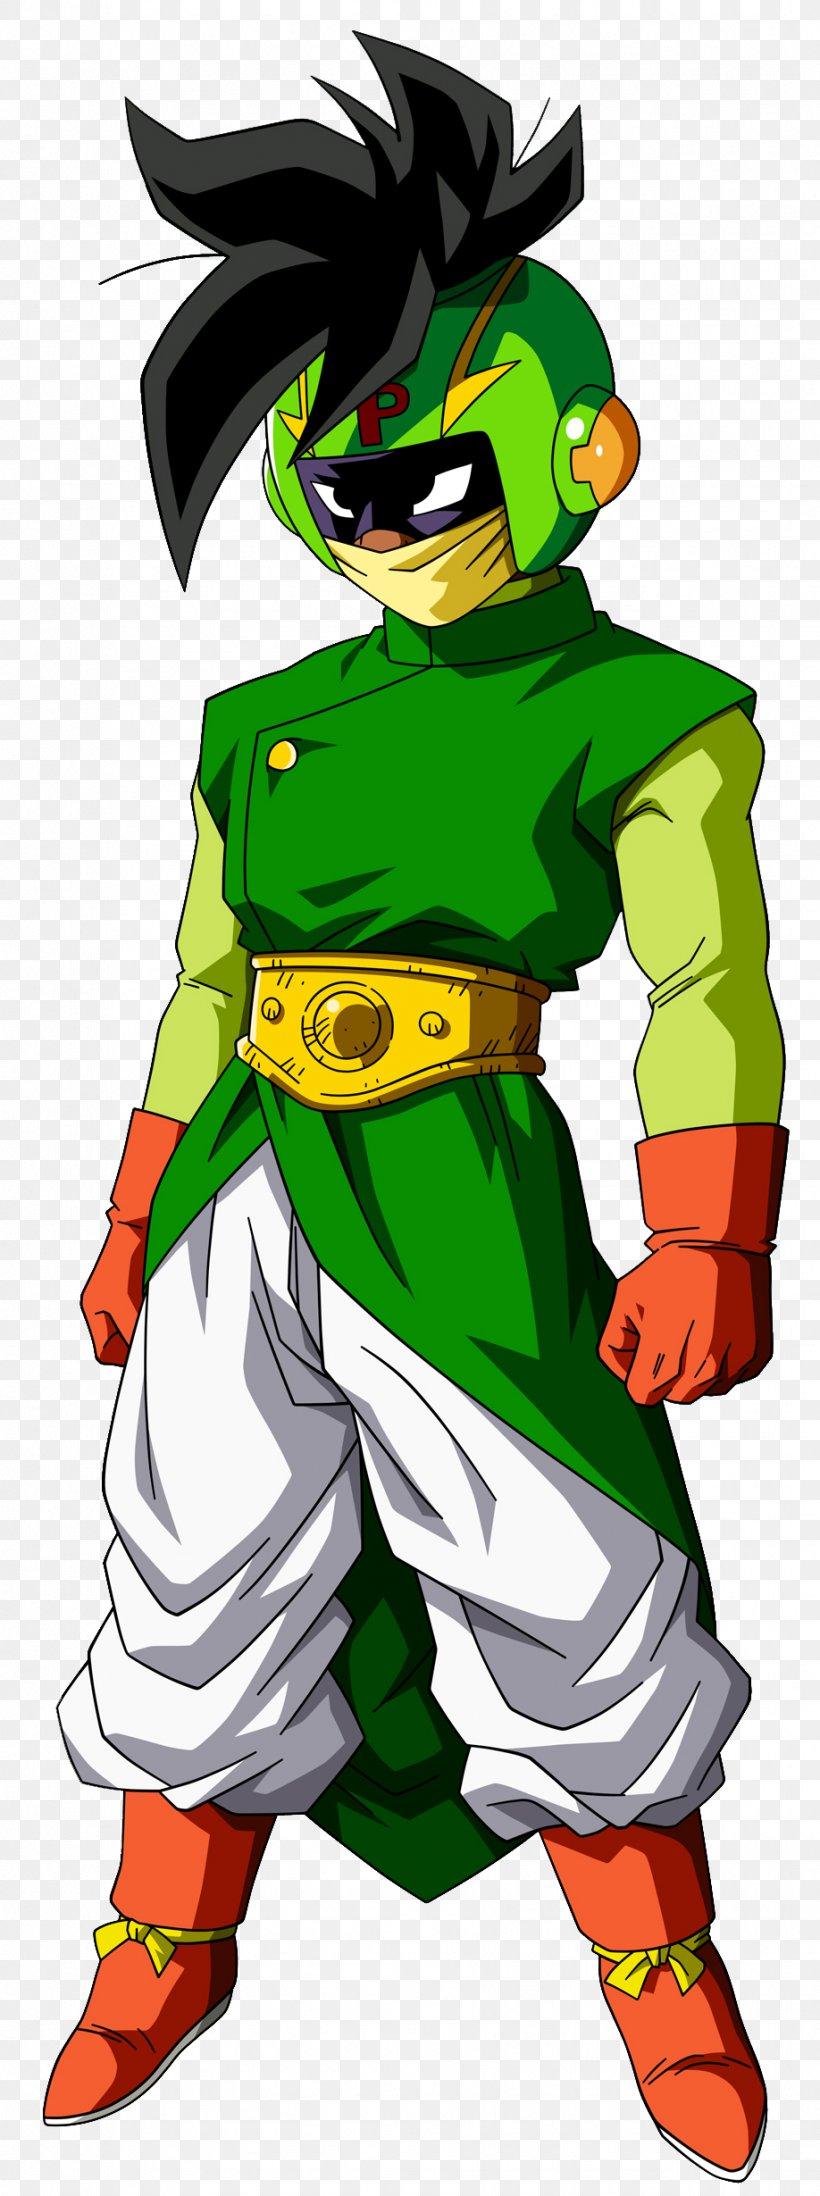 Uub Gohan Goku Cell Dragon Ball, PNG, 918x2459px, Uub, Art, Cartoon, Cell, Costume Download Free